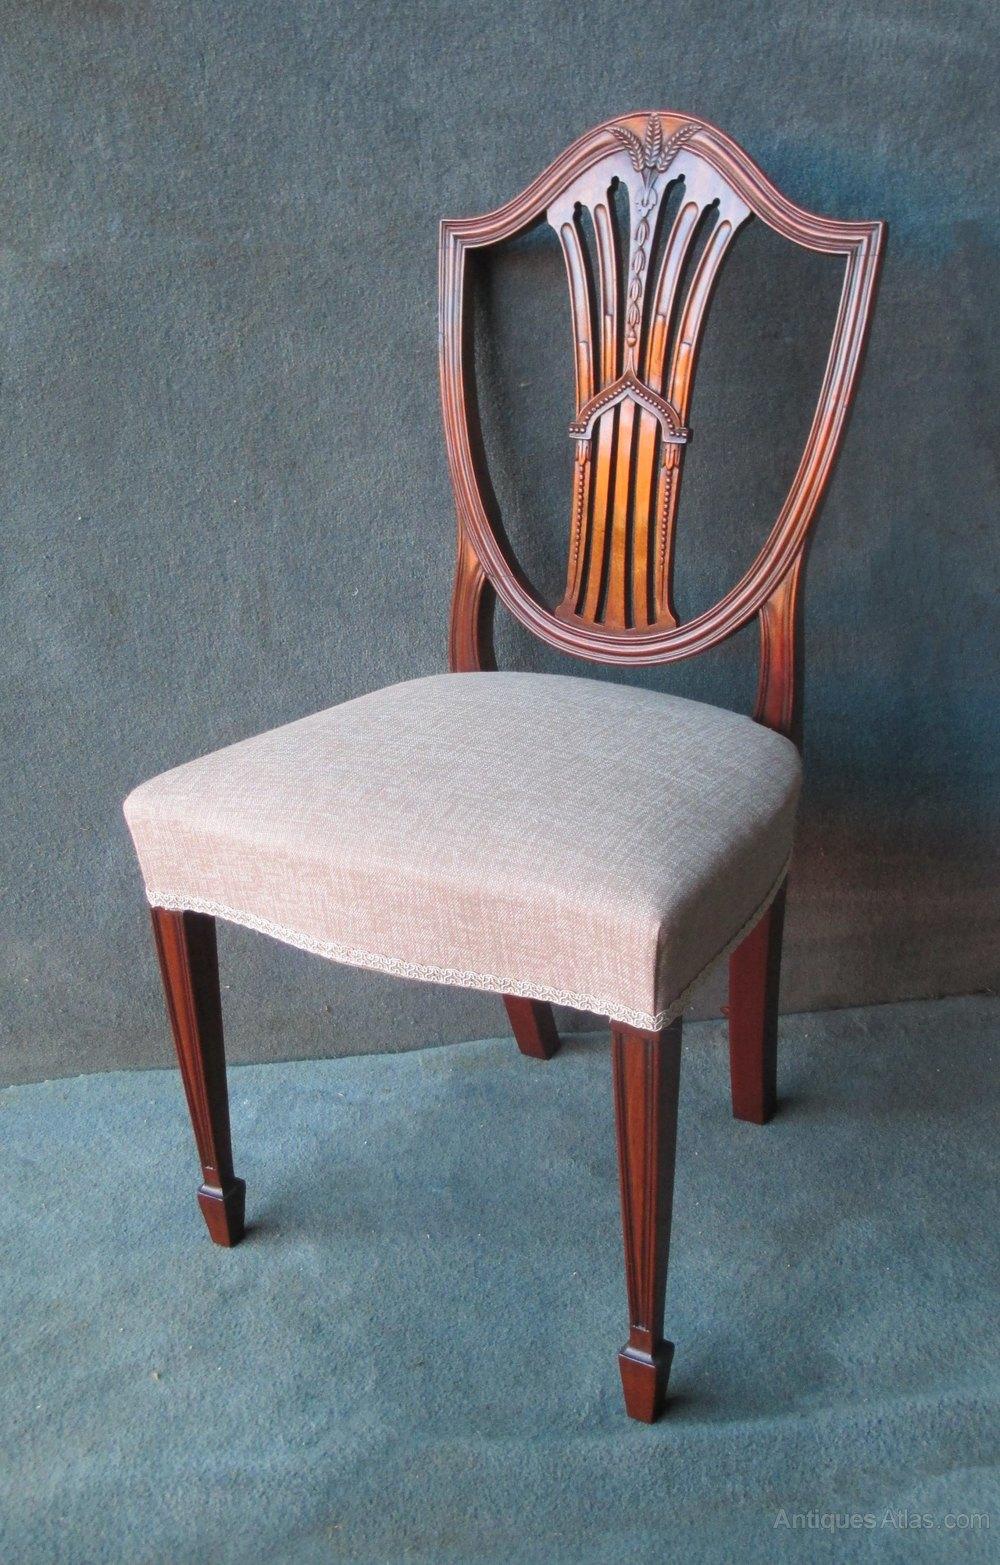 6 2 Mahogany Hepplewhite Style Shield Back Chairs